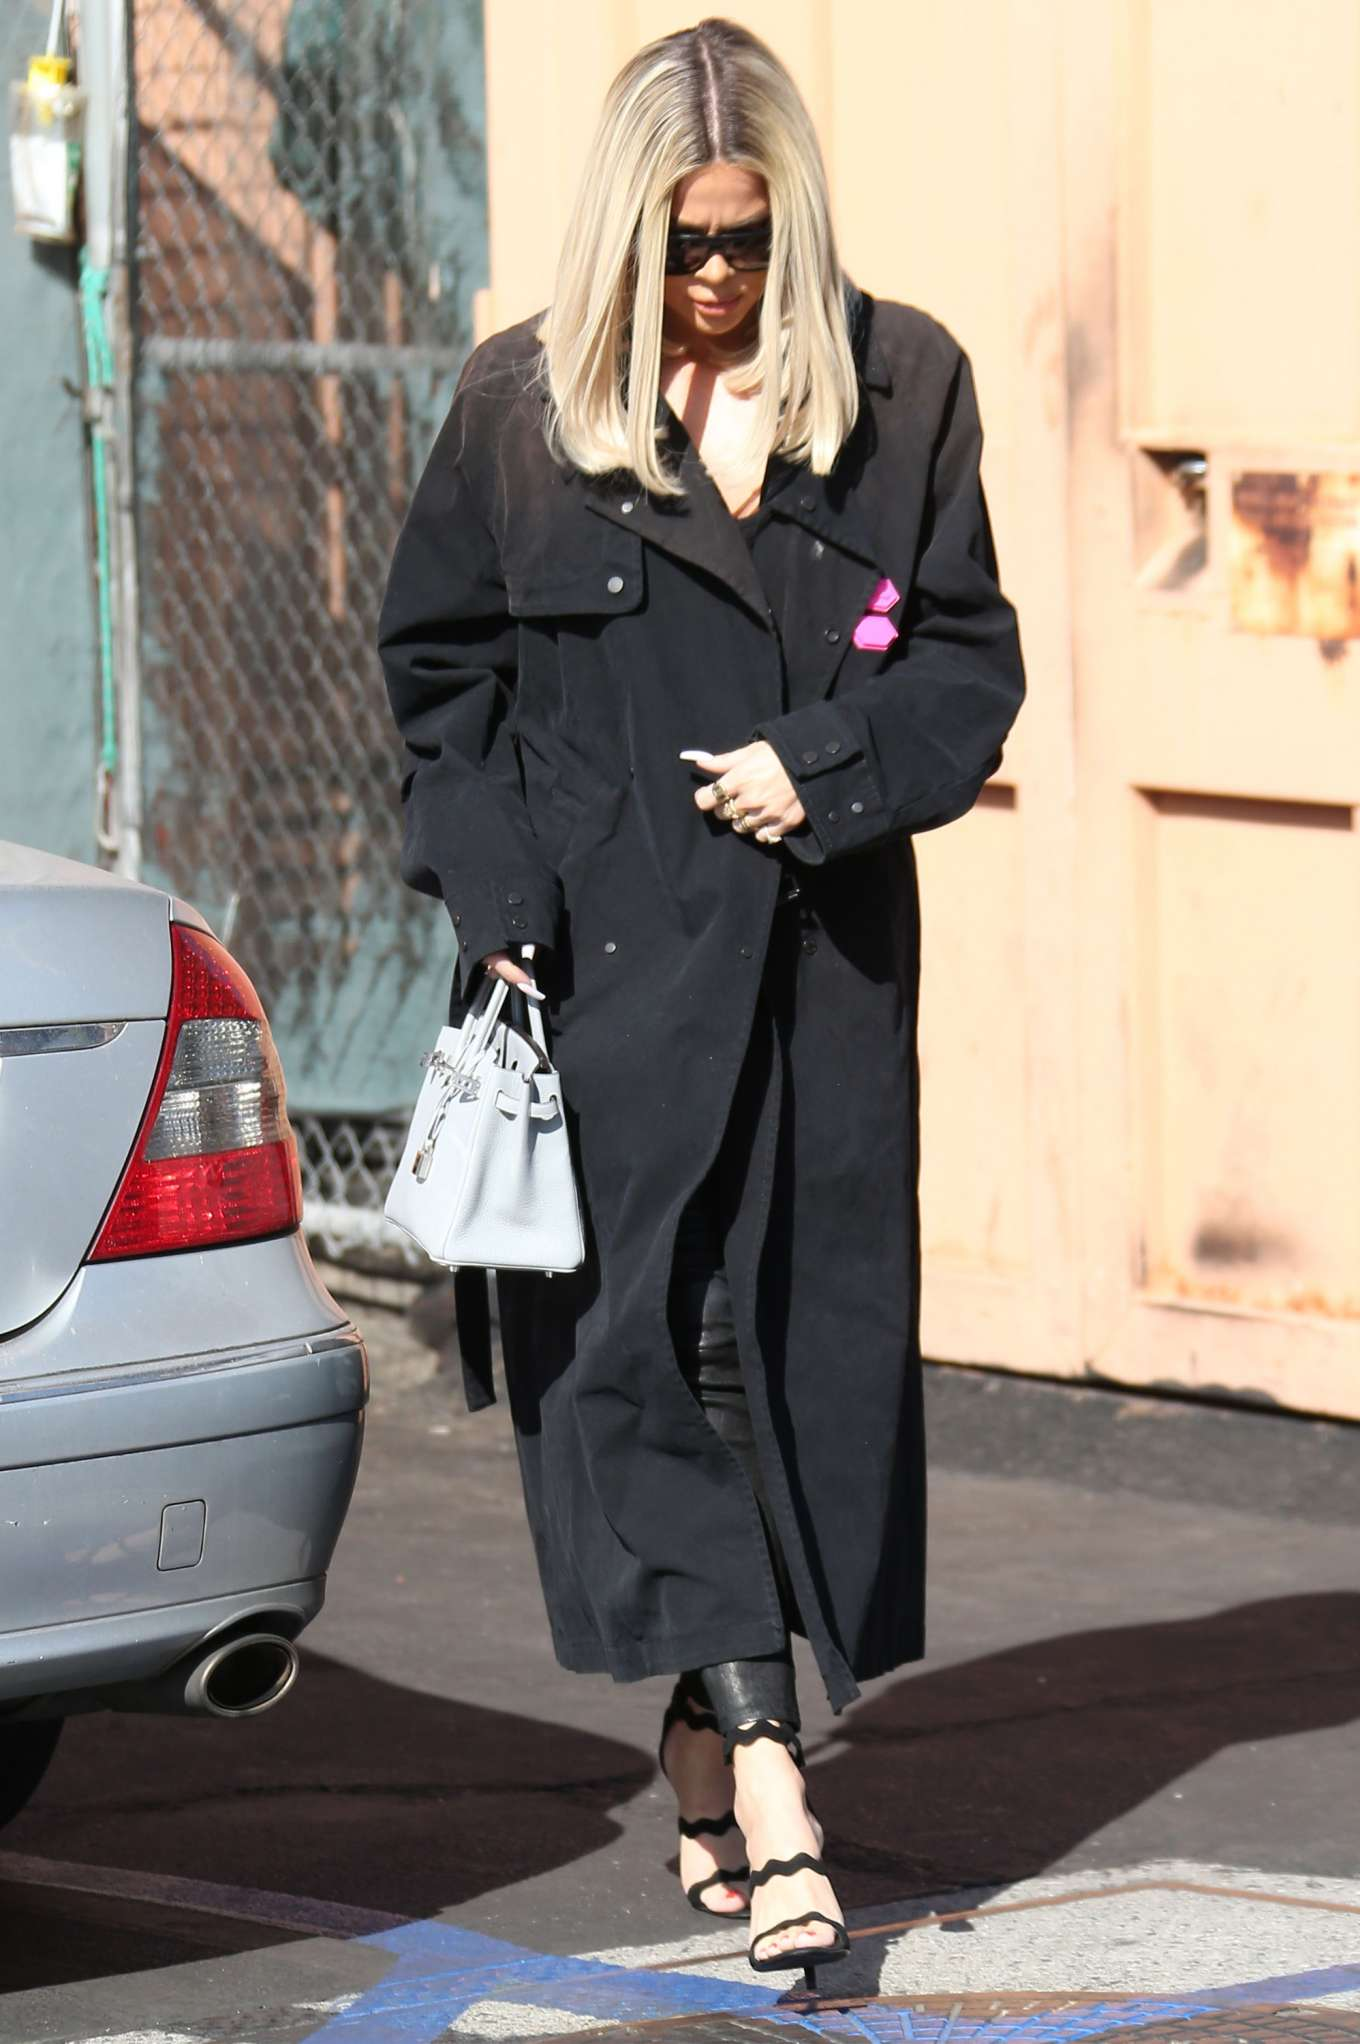 Khloe Kardashian 2019 : Khloe Kardashian – Leaving Emilios Trattoria Italian restaurant-09